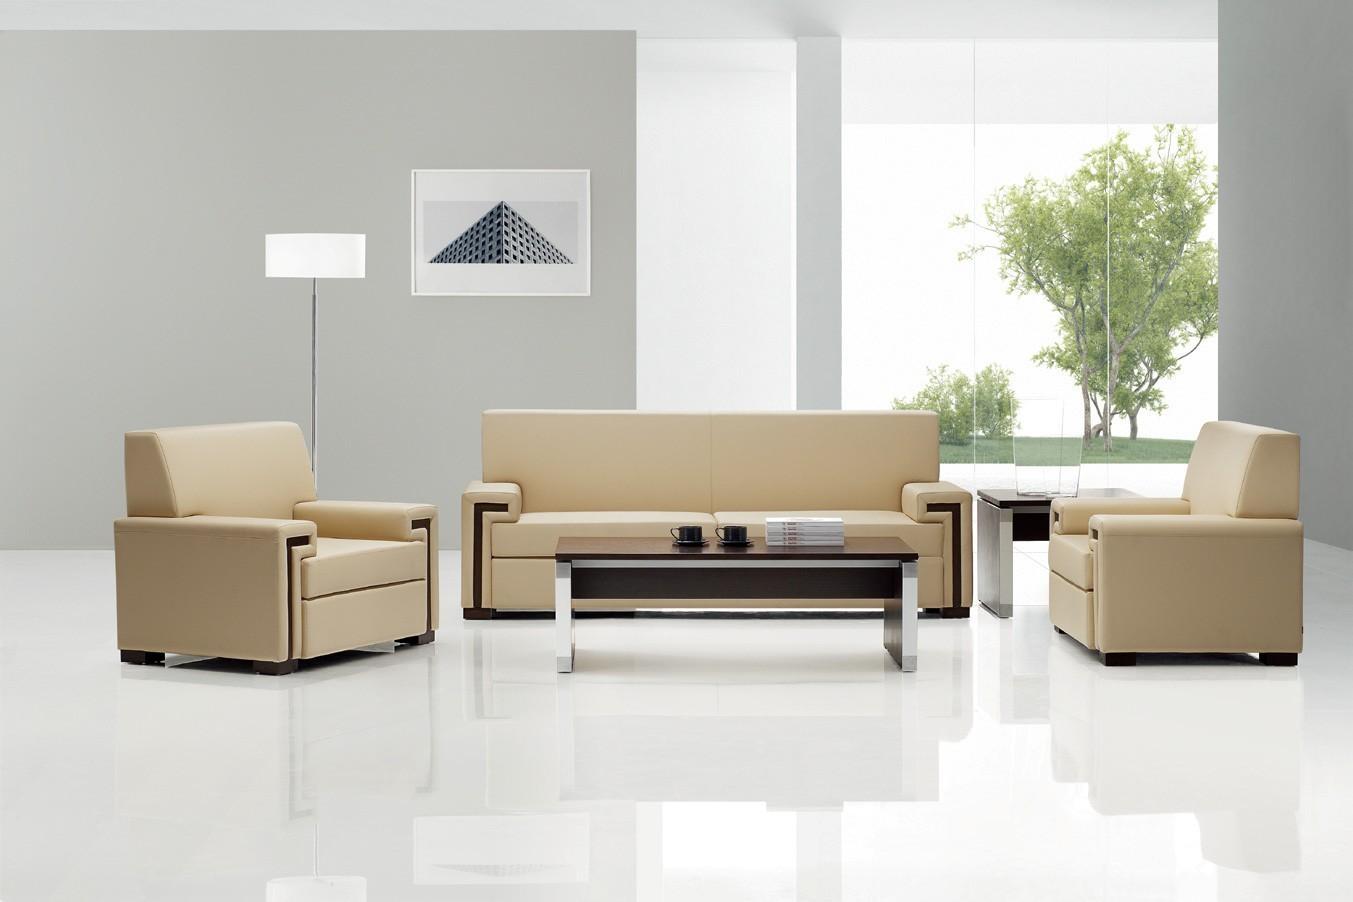 Sofa : Office Sofa Design Ideas Amazing Simple In Office Sofa With Office Sofa Chairs (View 13 of 20)